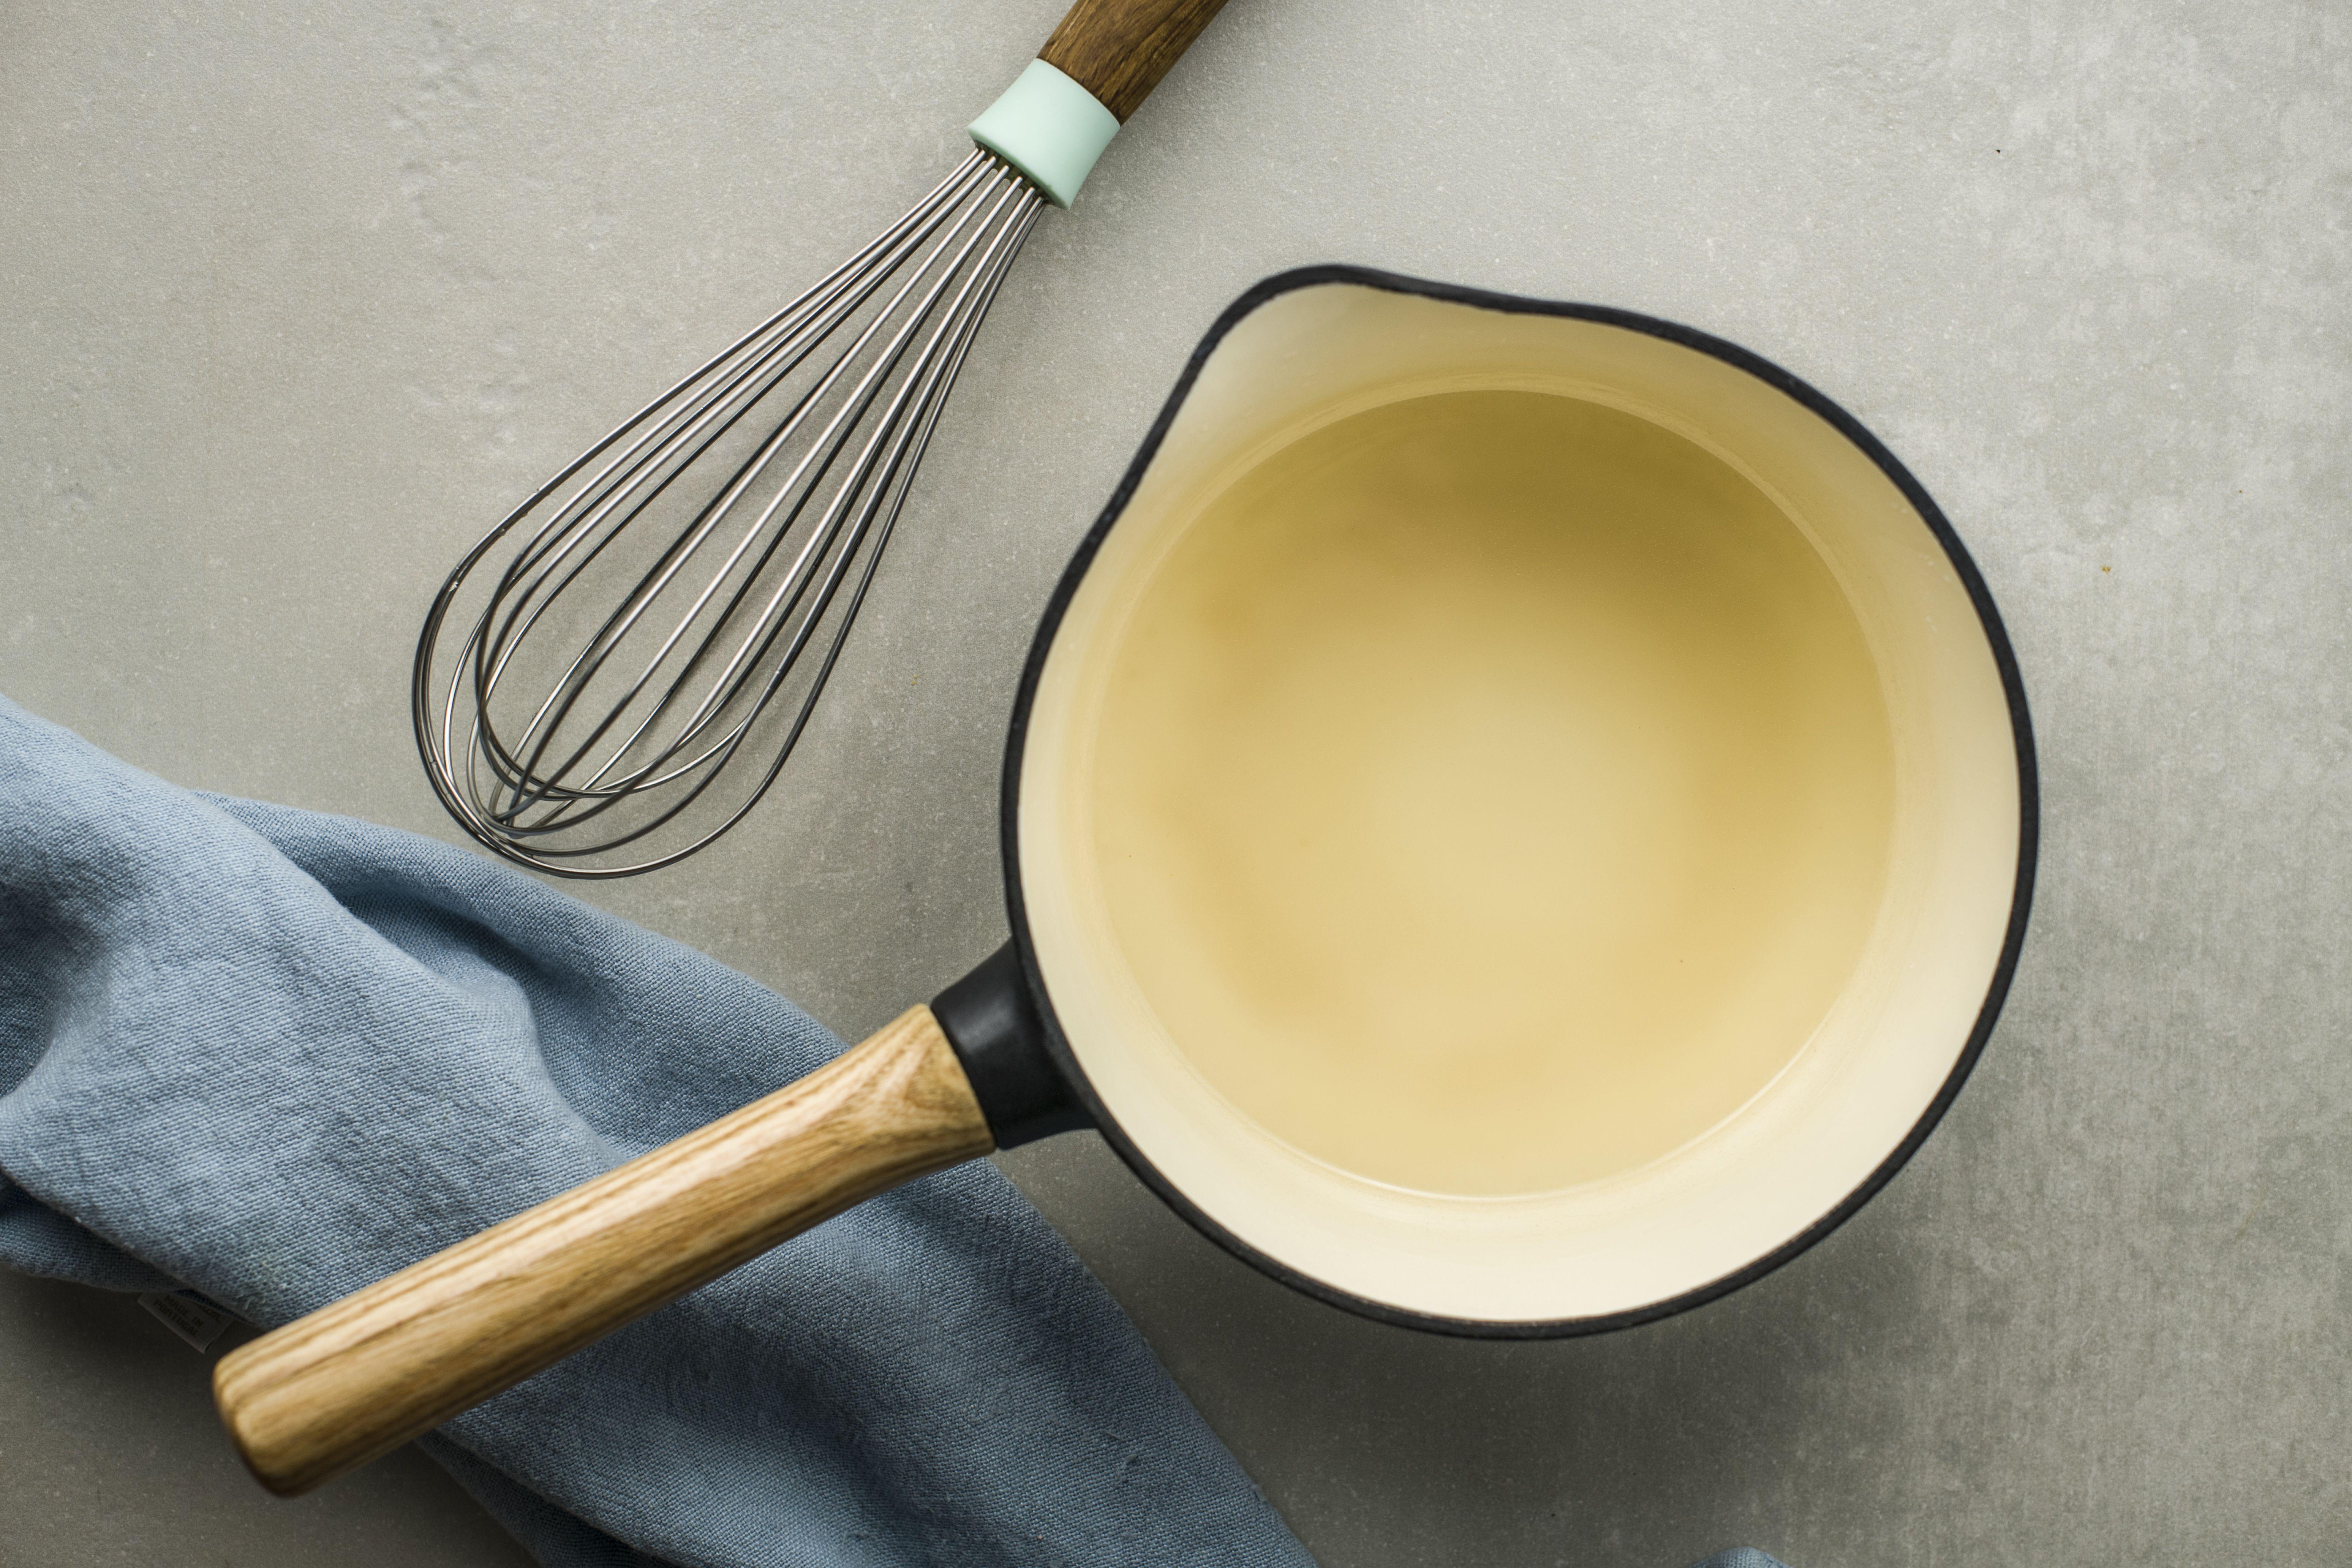 Stir until mixture is thick